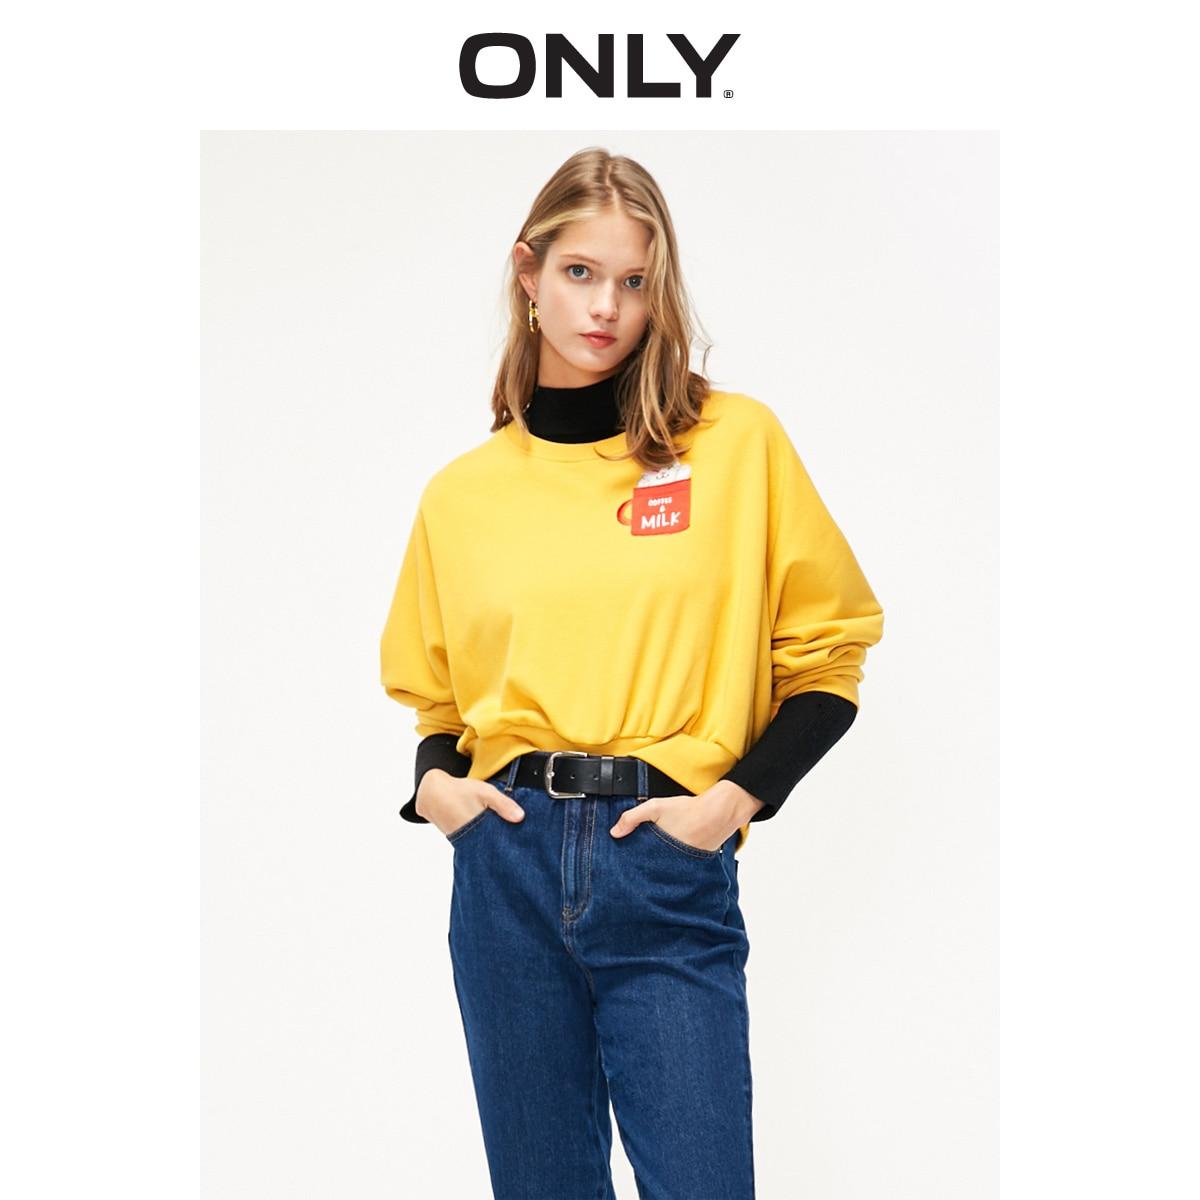 ONLY Women's Loose Fit Cartoon Pattern Batwing Sleeves Round Neckline Pullover Sweatshirt | 11919S511